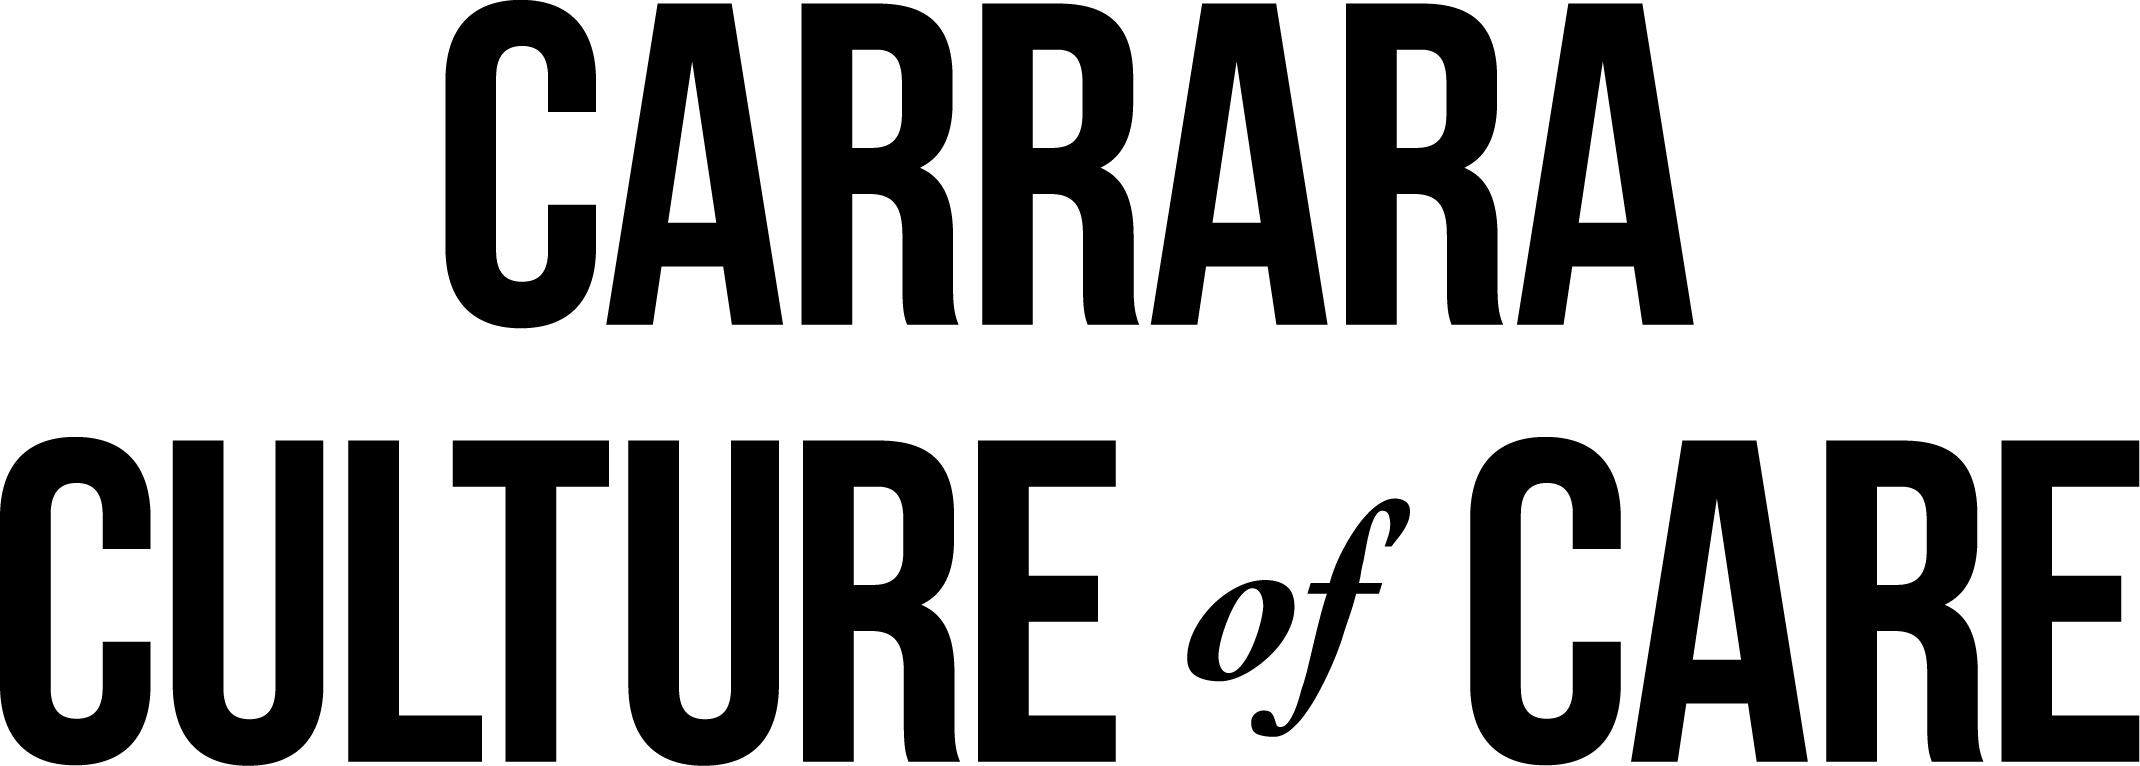 CARRARA CULTURE of CARE.